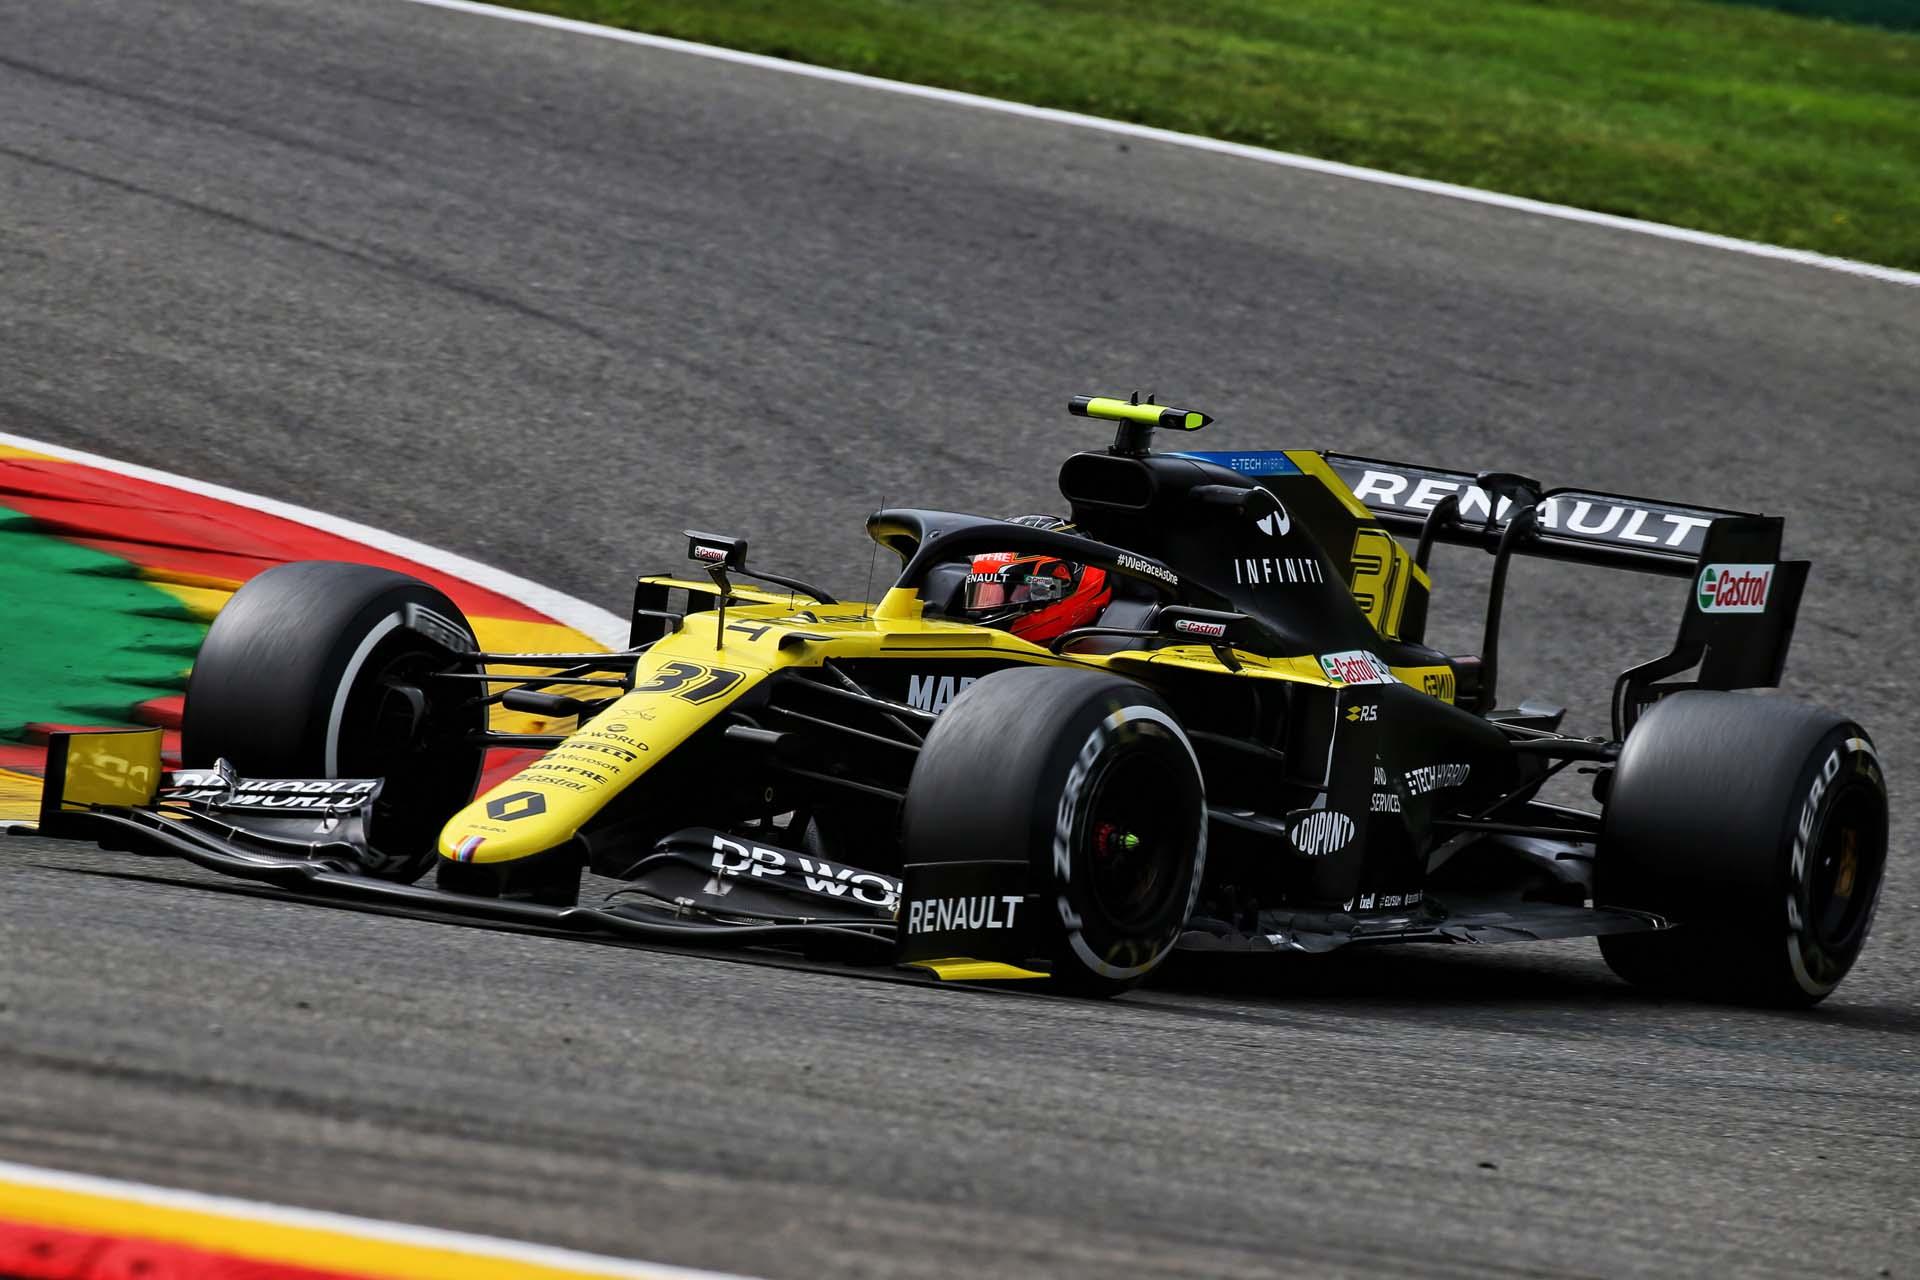 Motor Racing - Formula One World Championship - Belgian Grand Prix - Practice Day - Spa Francorchamps, Belgium